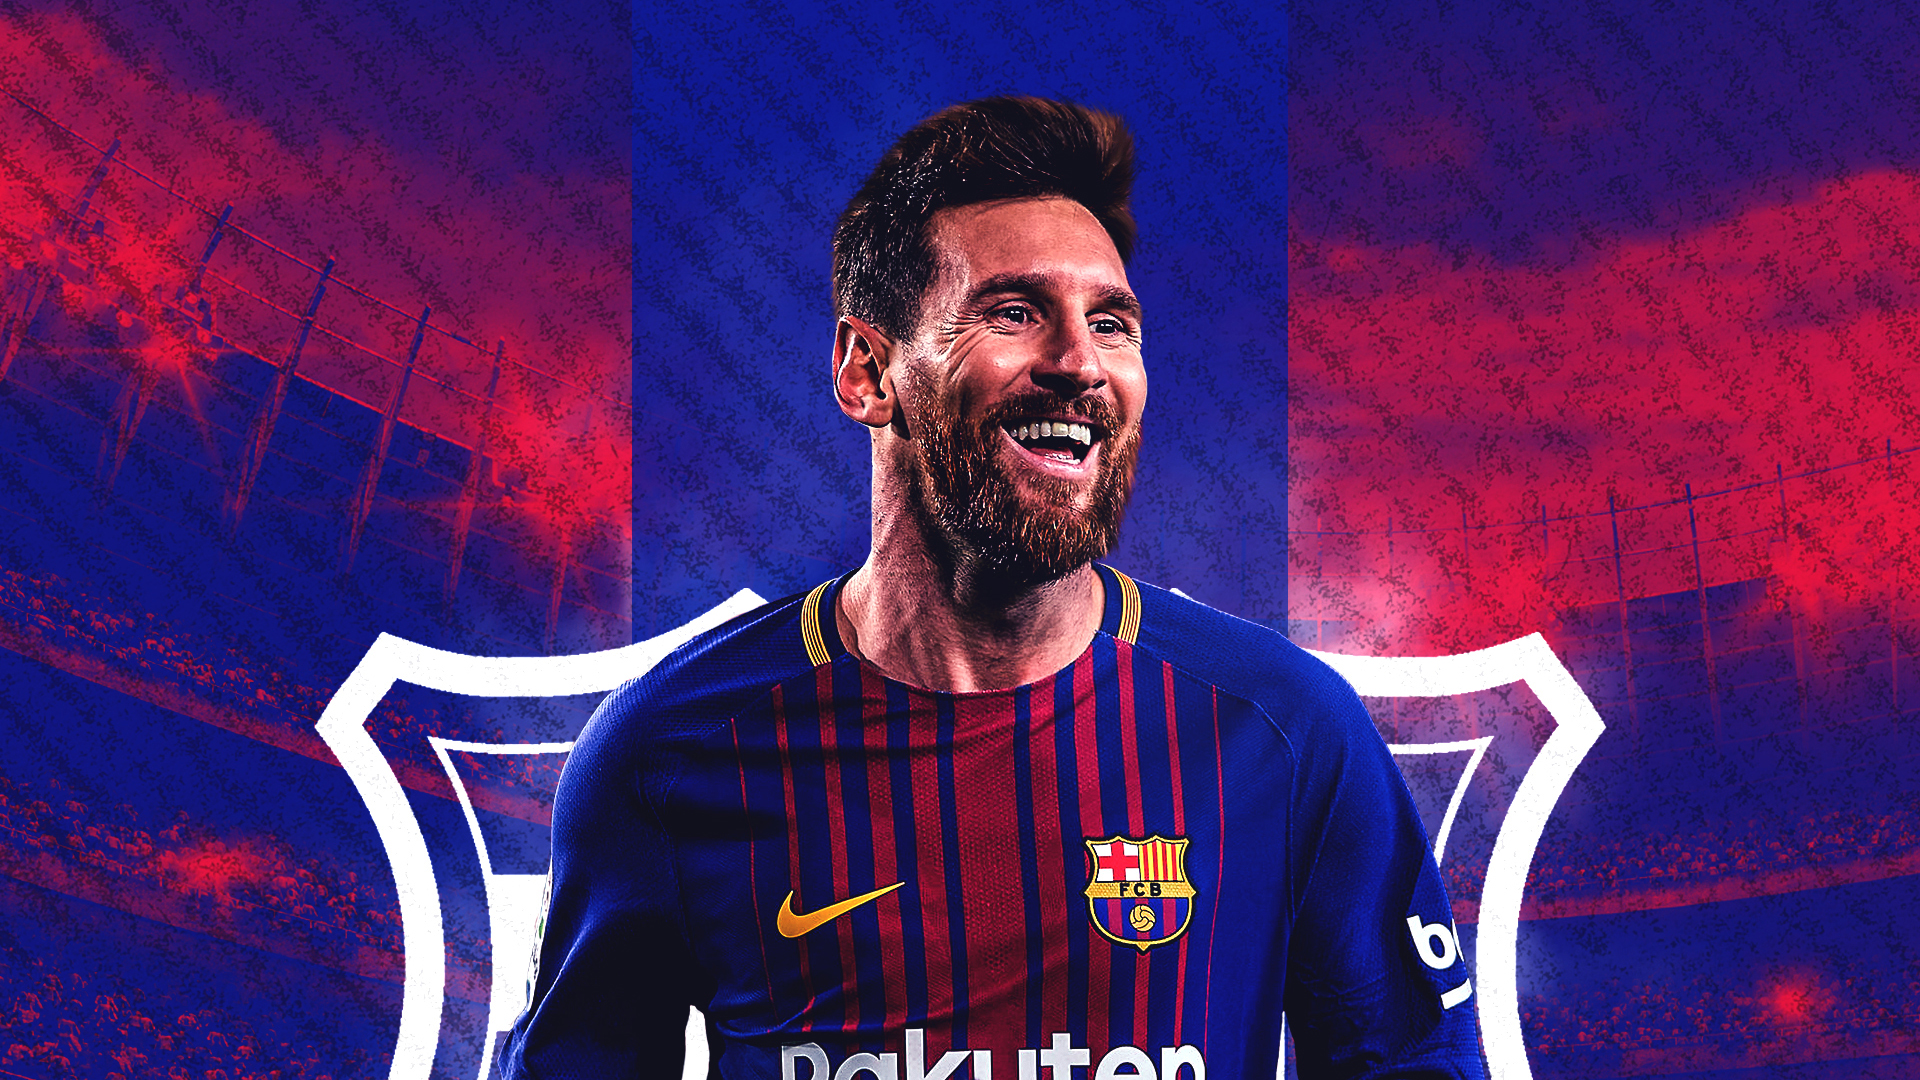 Mobile Wallpaper Cute Baby Wallpaper Lionel Messi Jordan Lionel Messi